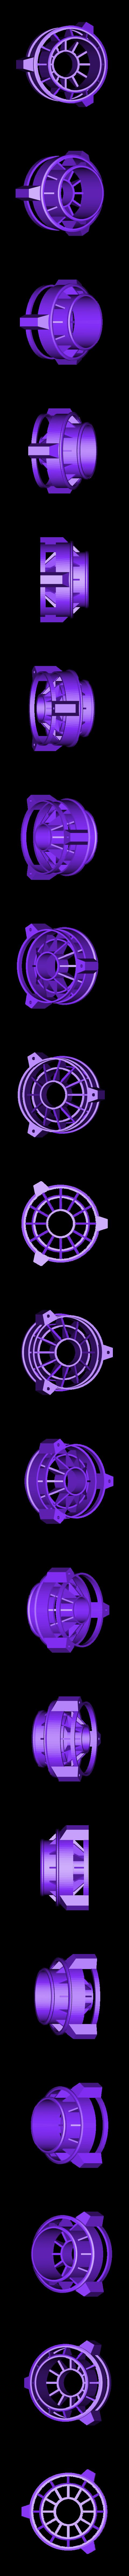 bhl-headlight-a.stl Download free STL file NeoPixel Bike Light • 3D printer template, Adafruit